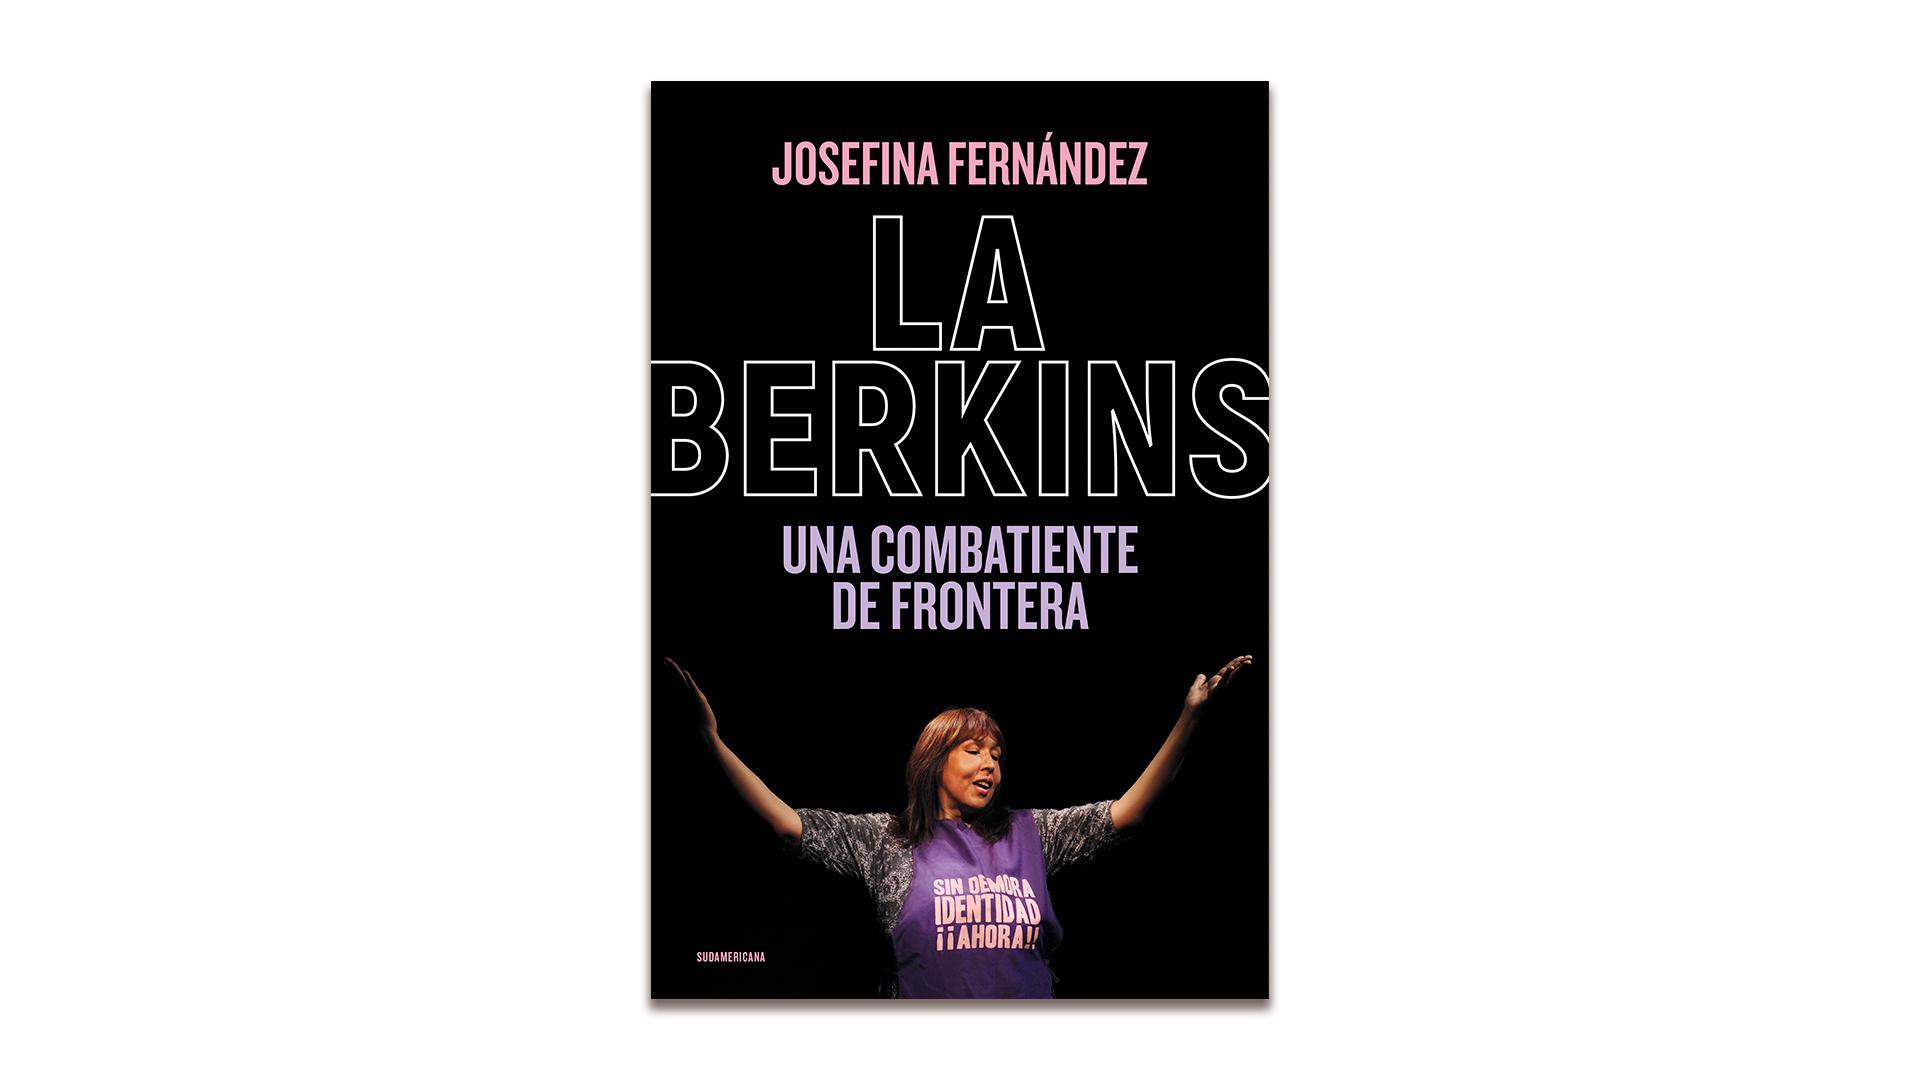 Lohana-Berkins_02